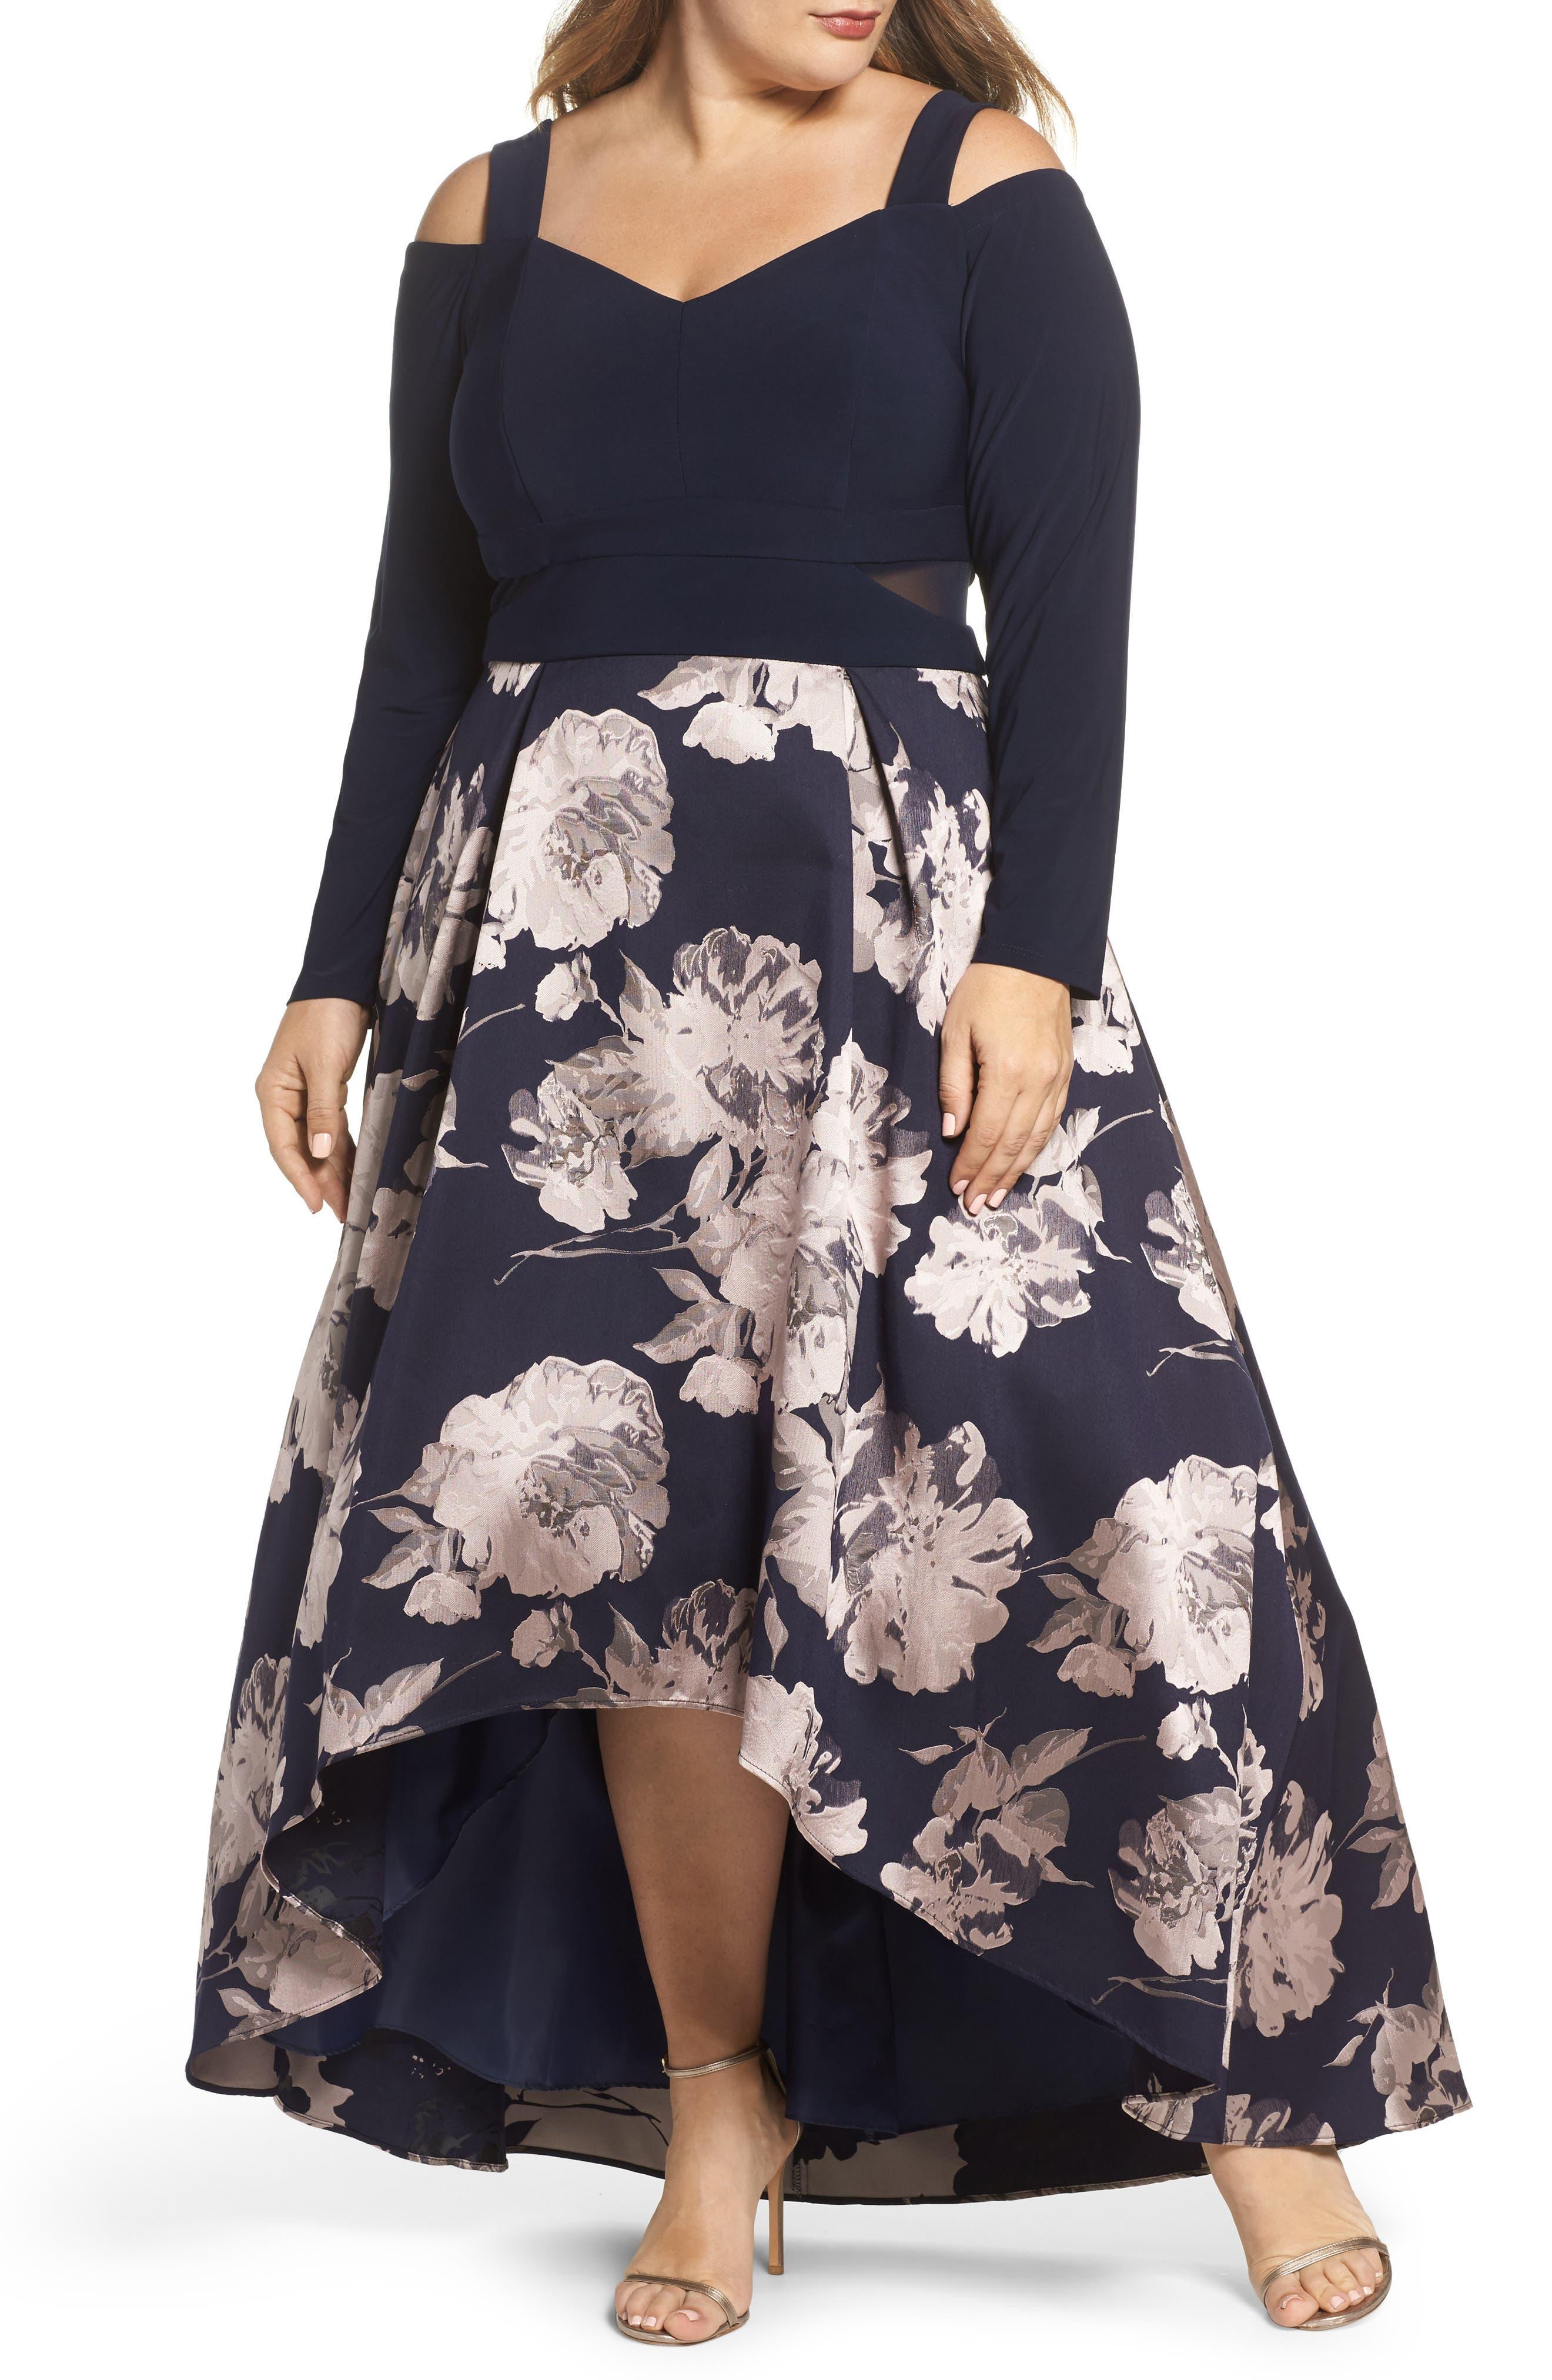 Alternate Image 1 Selected - Xscape Cold Shoulder Brocade High/Low Dress (Plus Size)